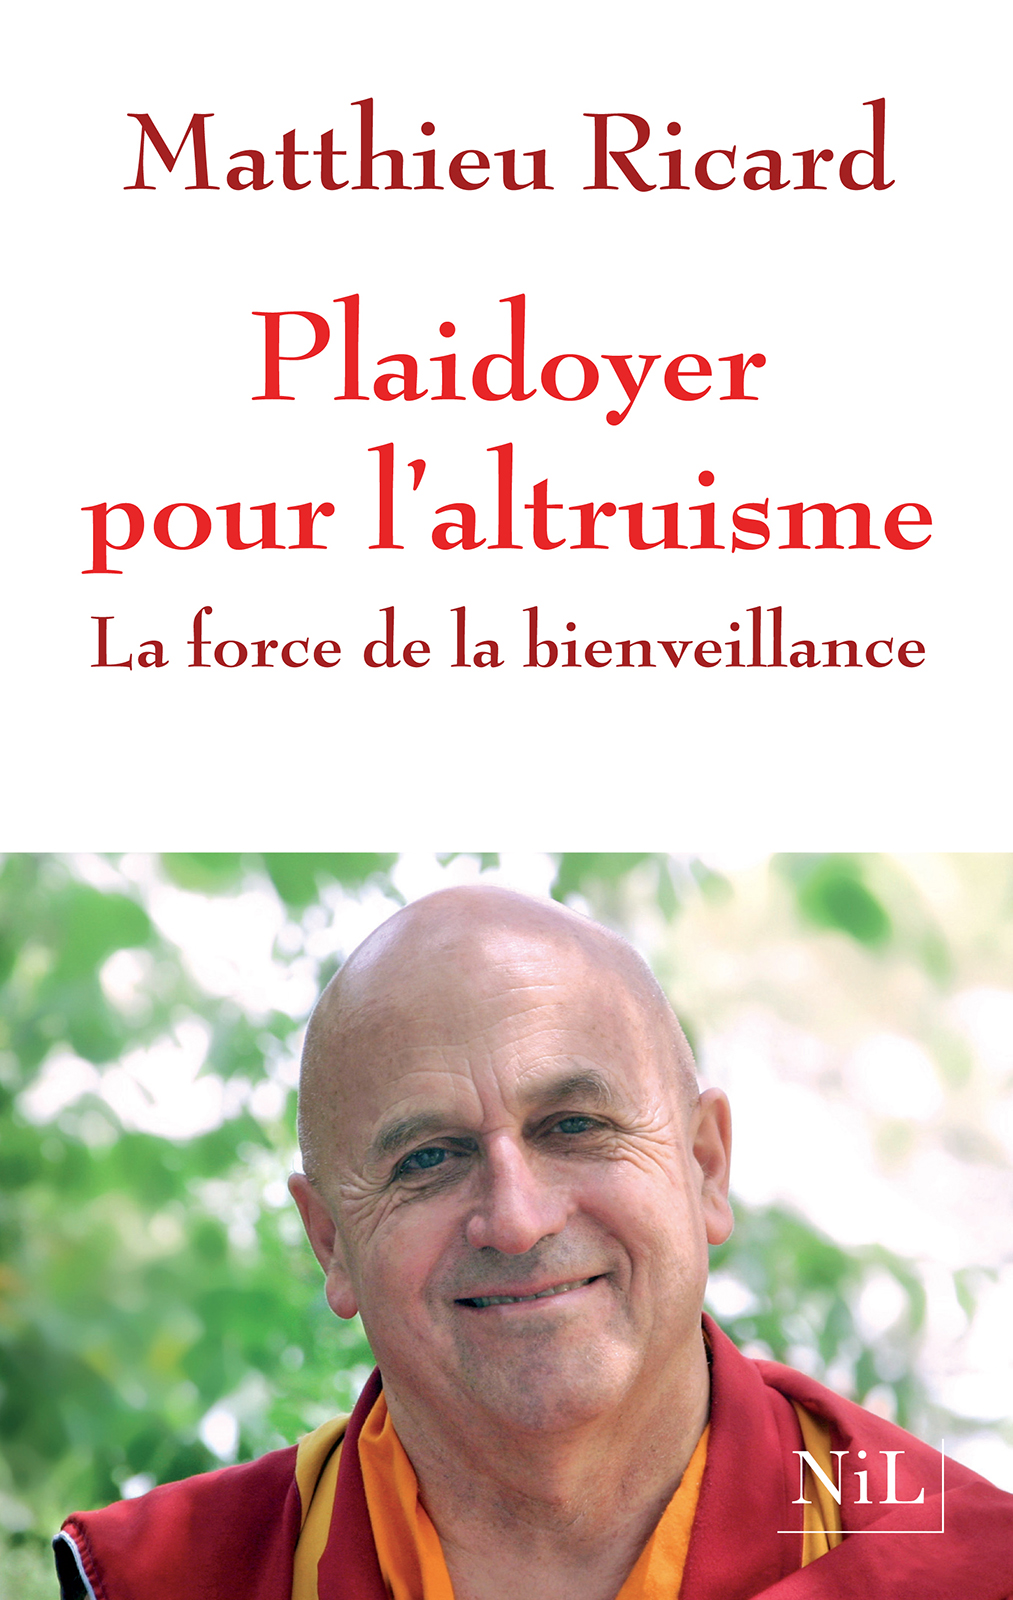 Plaidoyer pour l'altruisme   RICARD, Matthieu